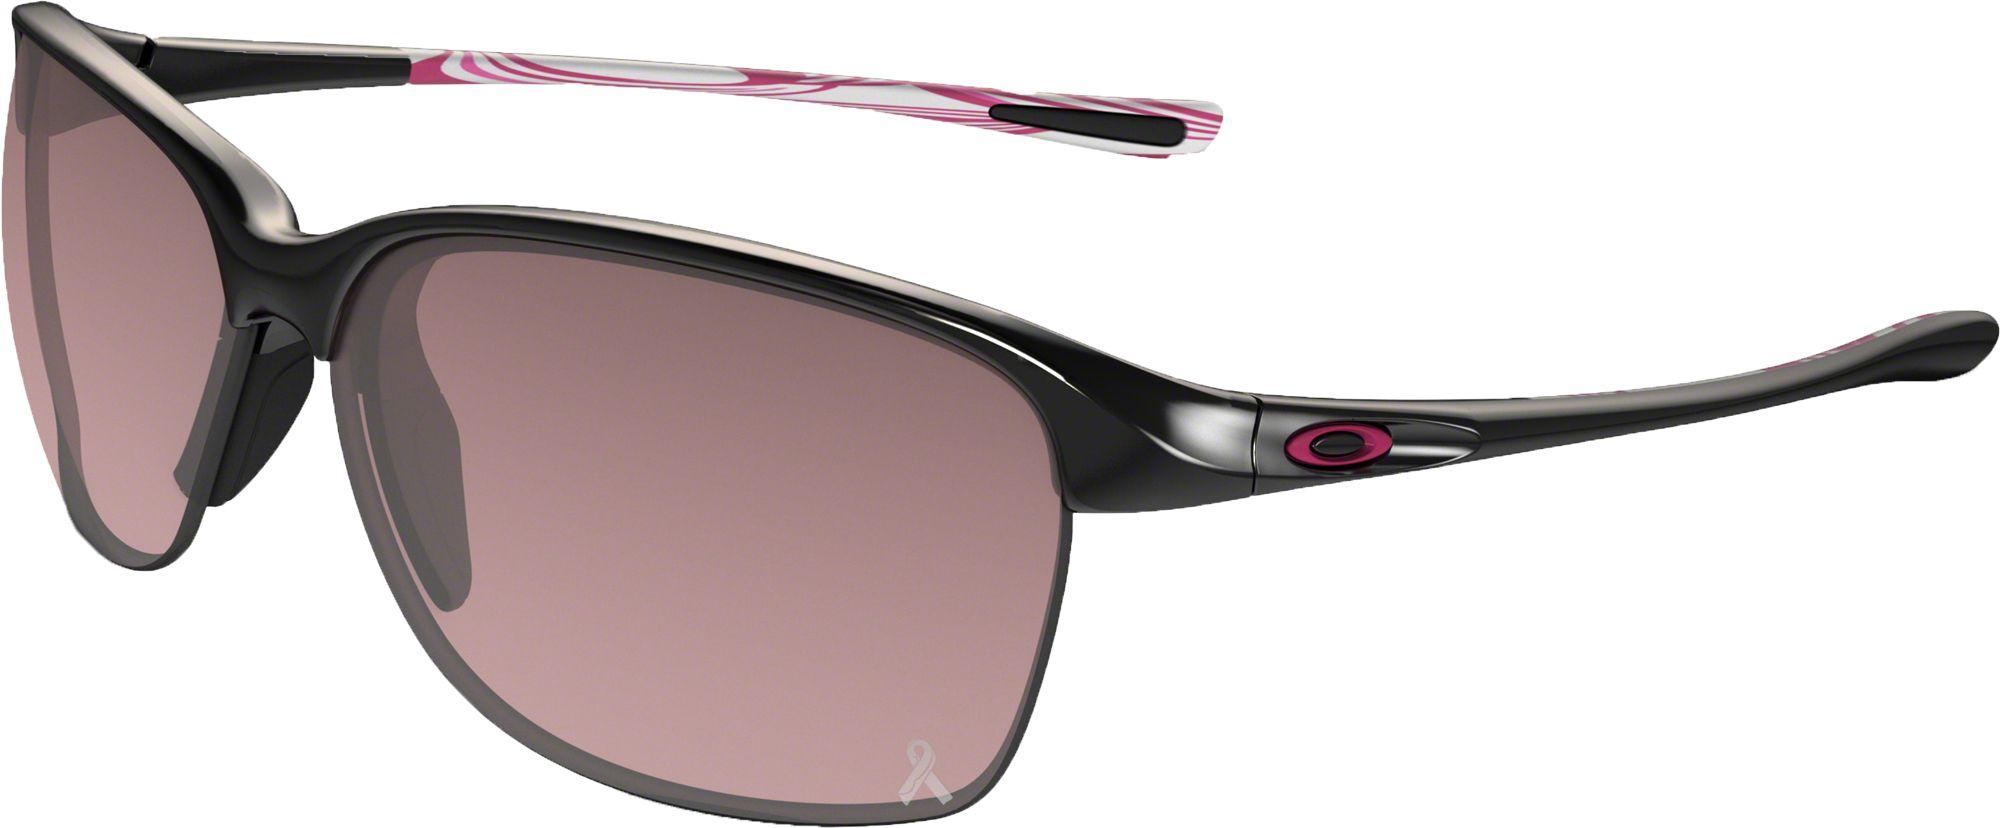 oakley womens encounter sunglasses repair glass